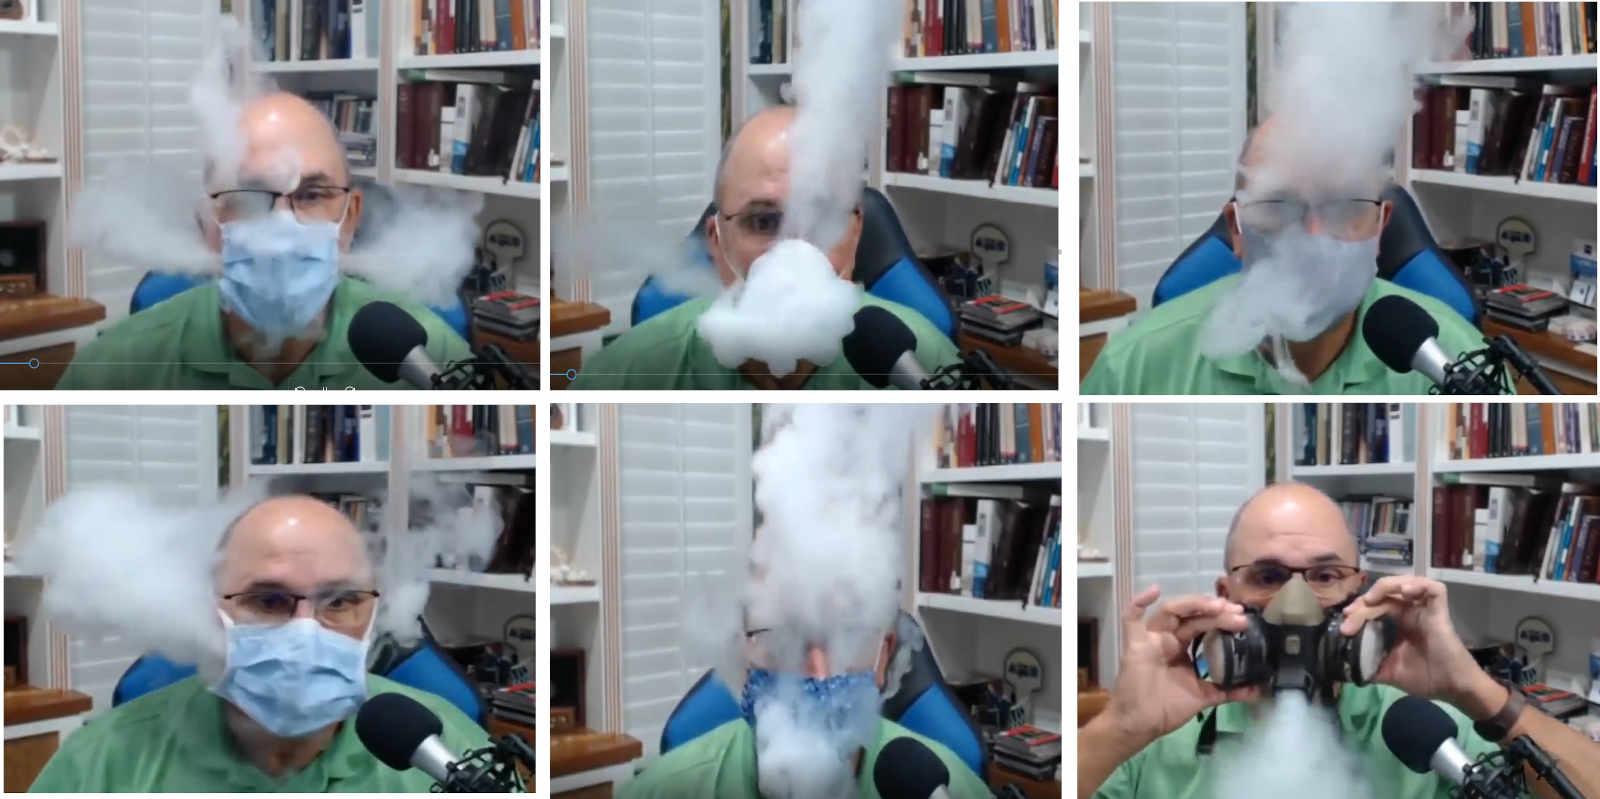 Wydychany aerozol i maski na twarz